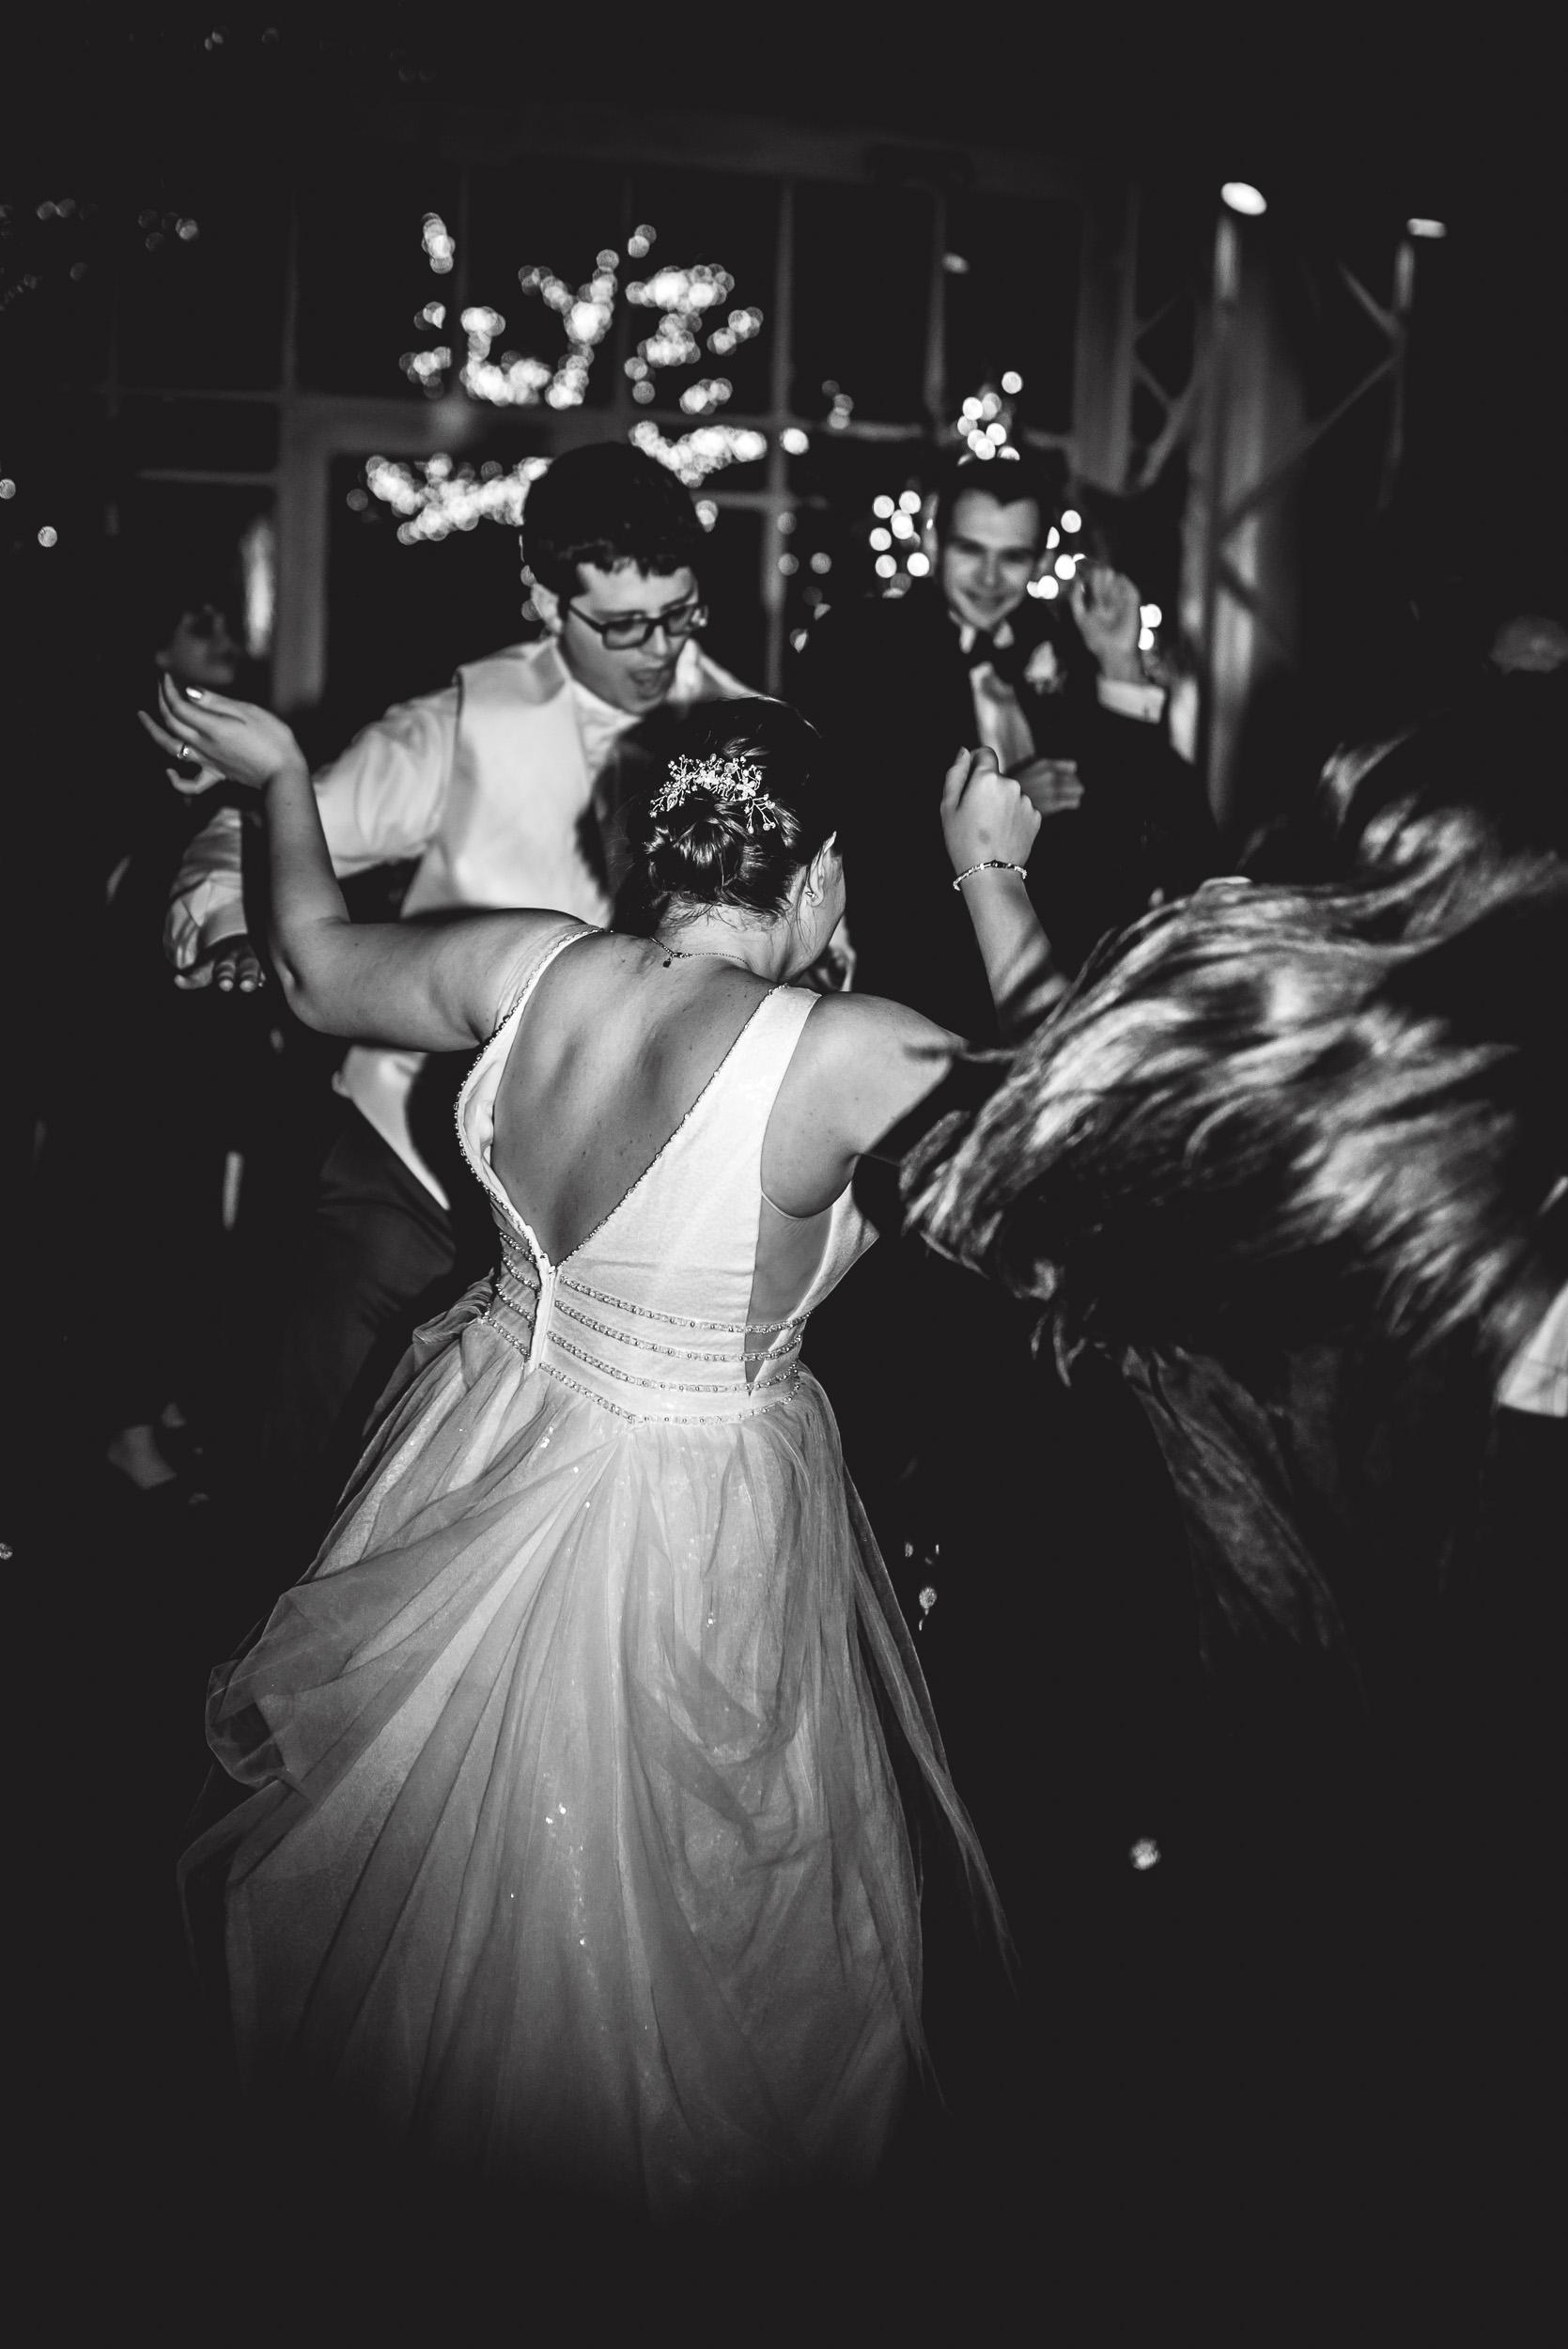 KatieandMathias_Morristown_NewJersey_Wedding_Church_Assumption_Madison_Hotel(58of65).jpg